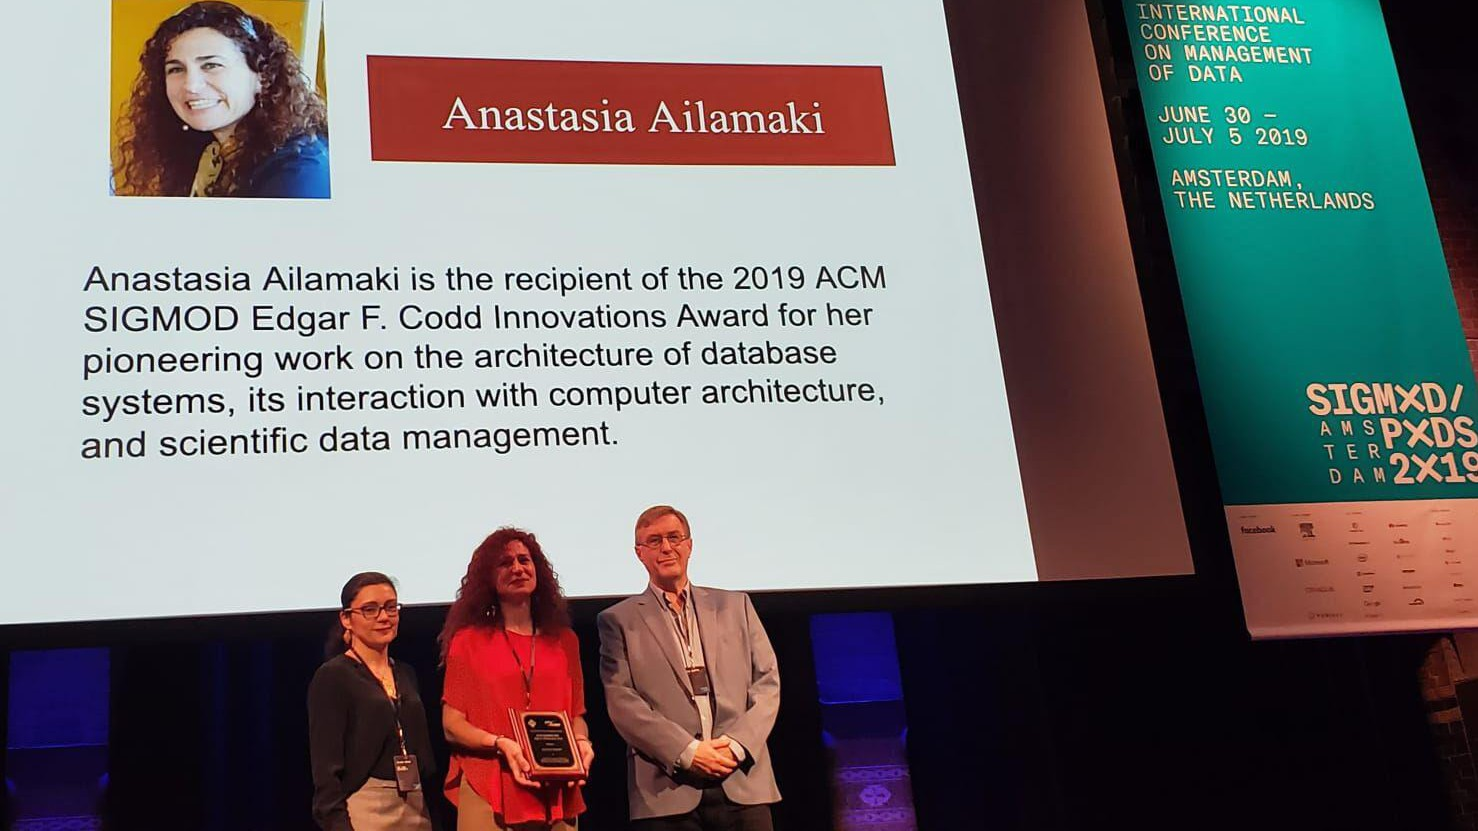 RAW Labs CEO Anastasia Ailamaki wins prestigious ACM SIGMOD Edgar F. Codd Innovation Award